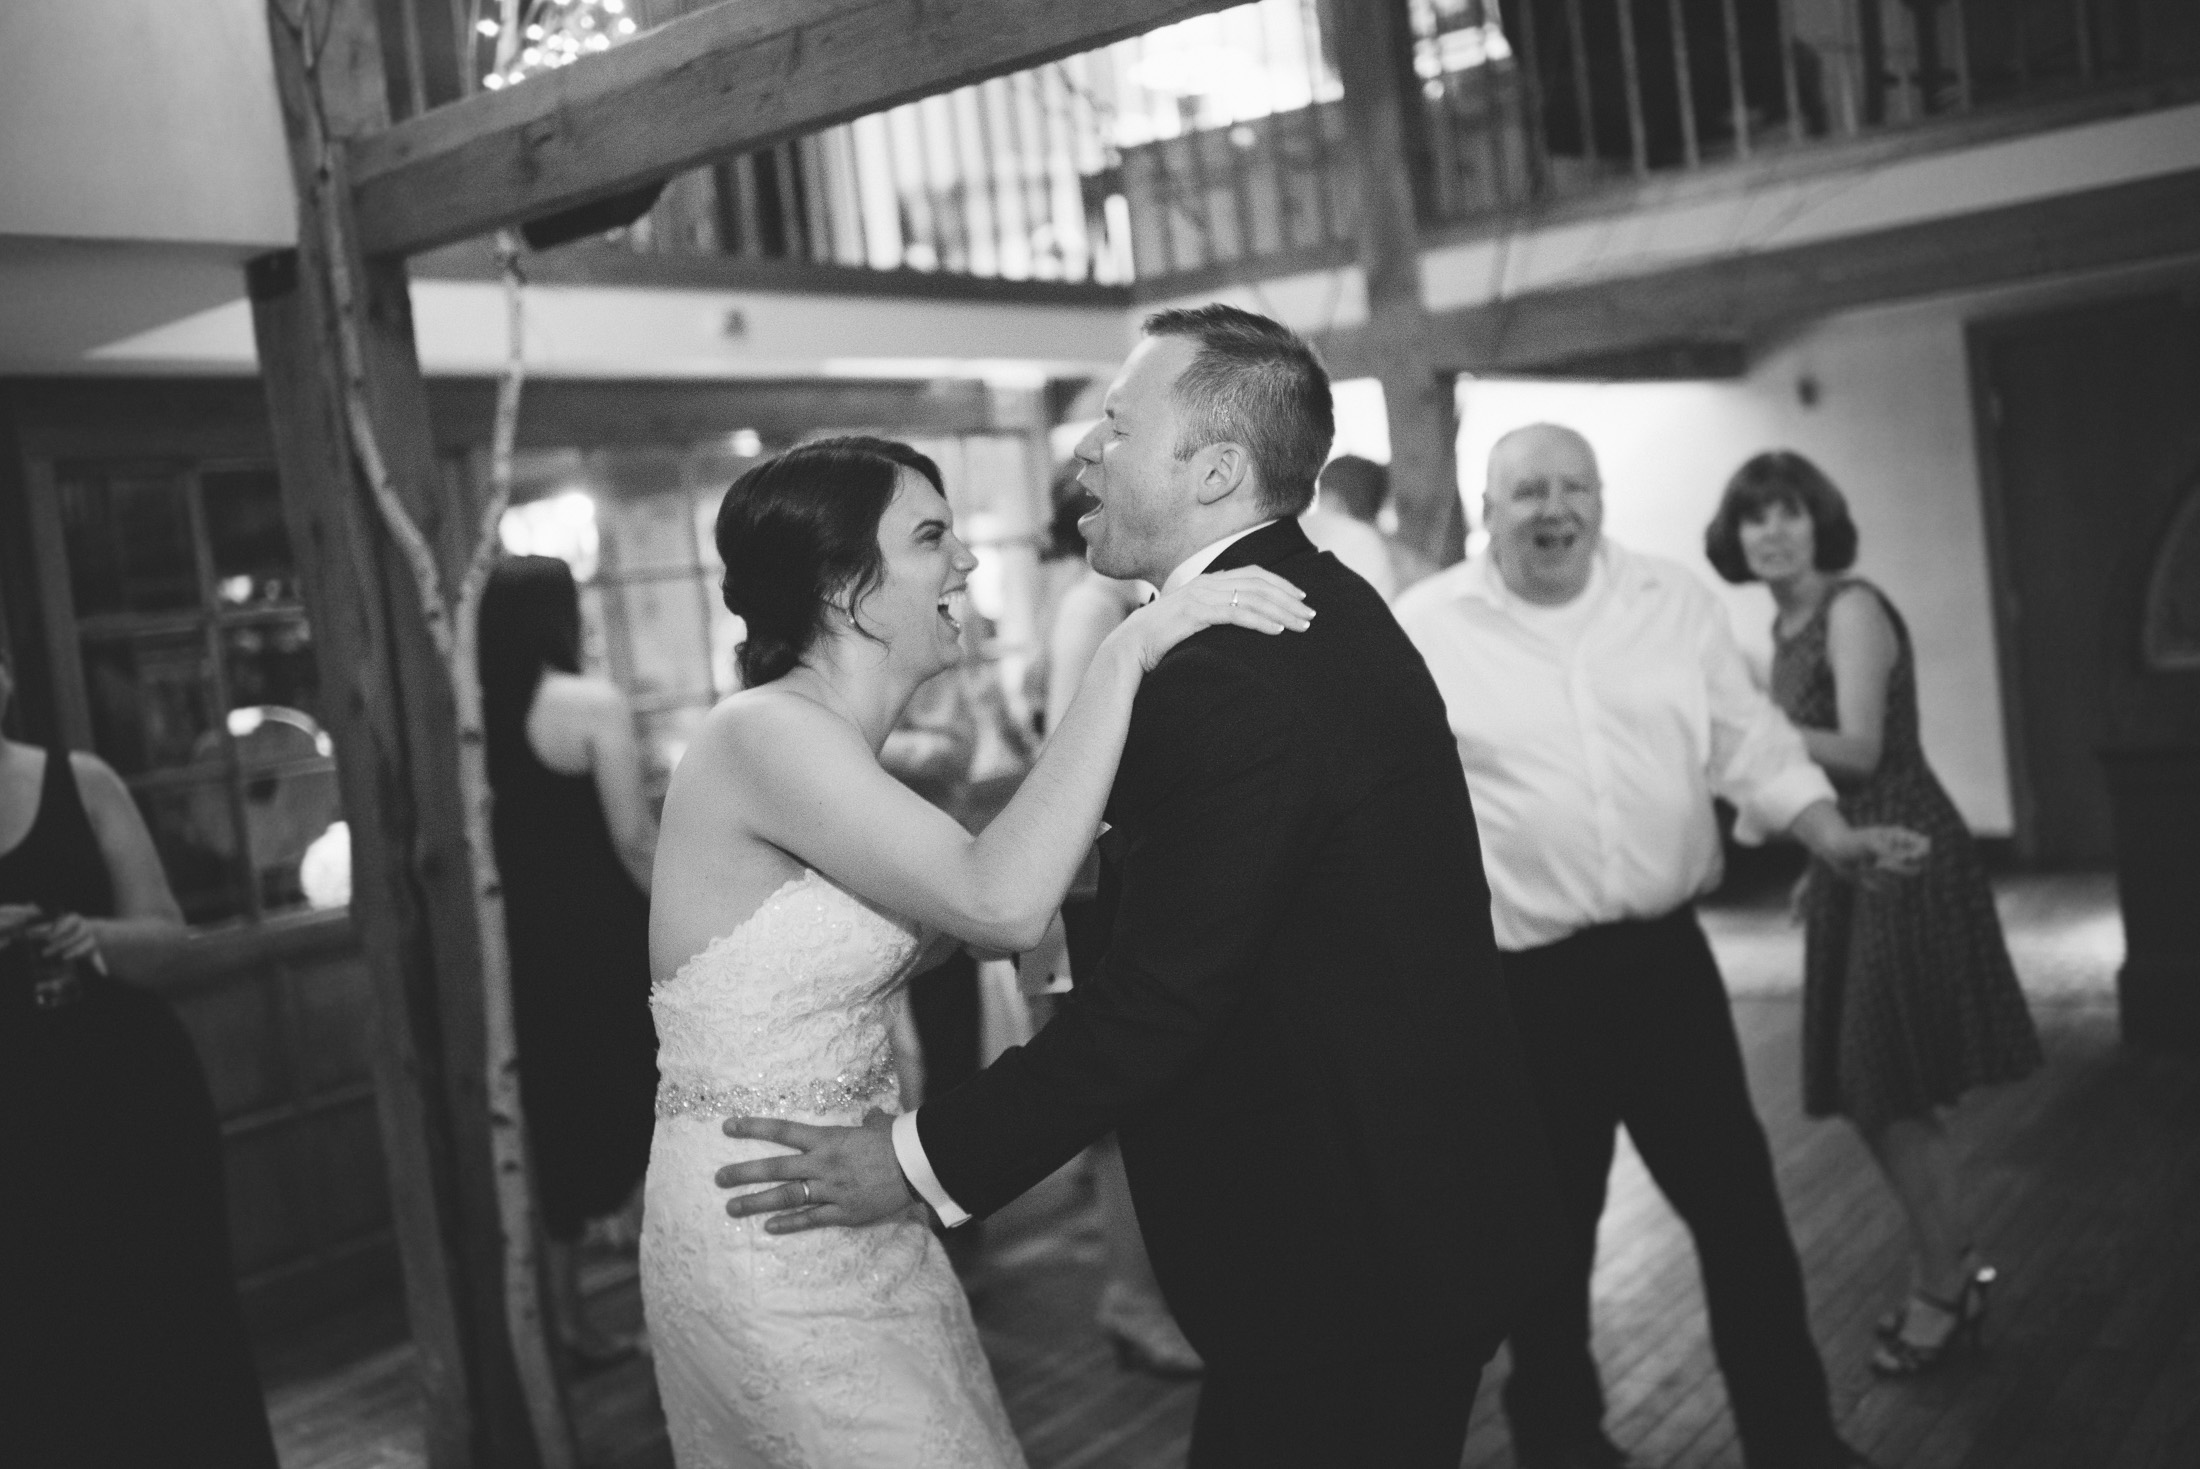 NH Wedding Photographer: reception dancing